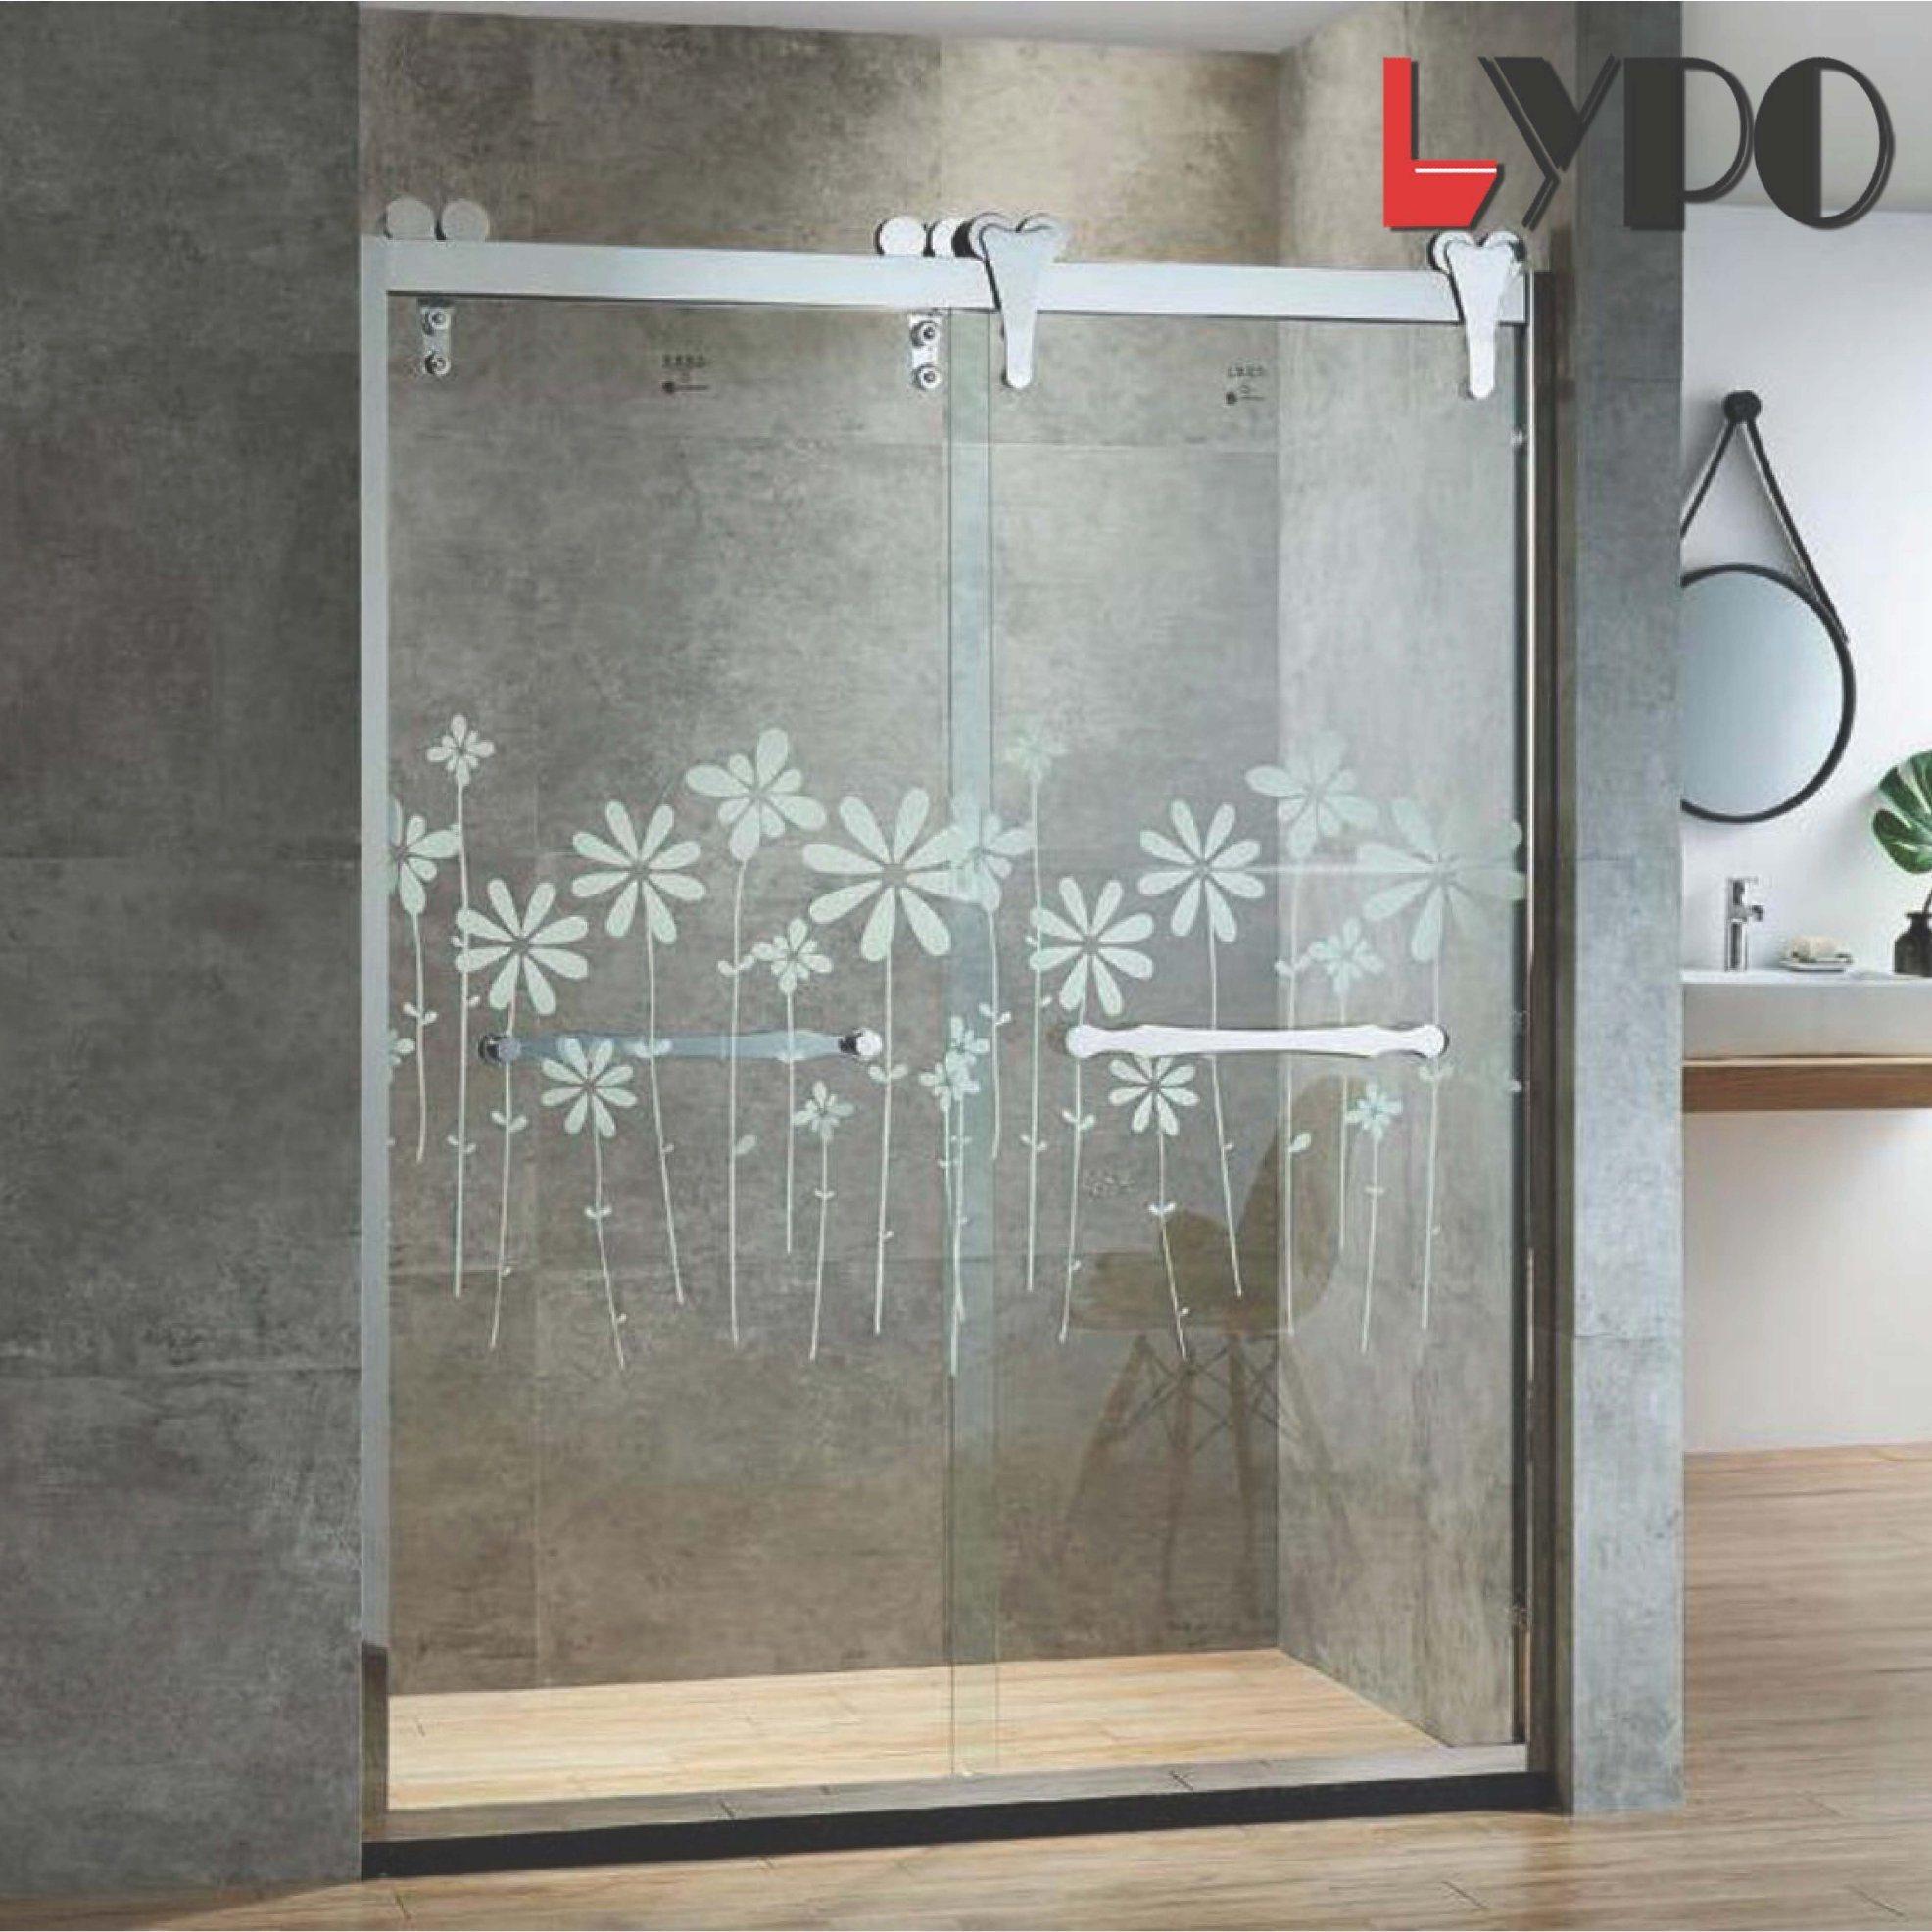 China Luxury Painting Sanitary Ware 10mm Tempered Glass Bathroom Big